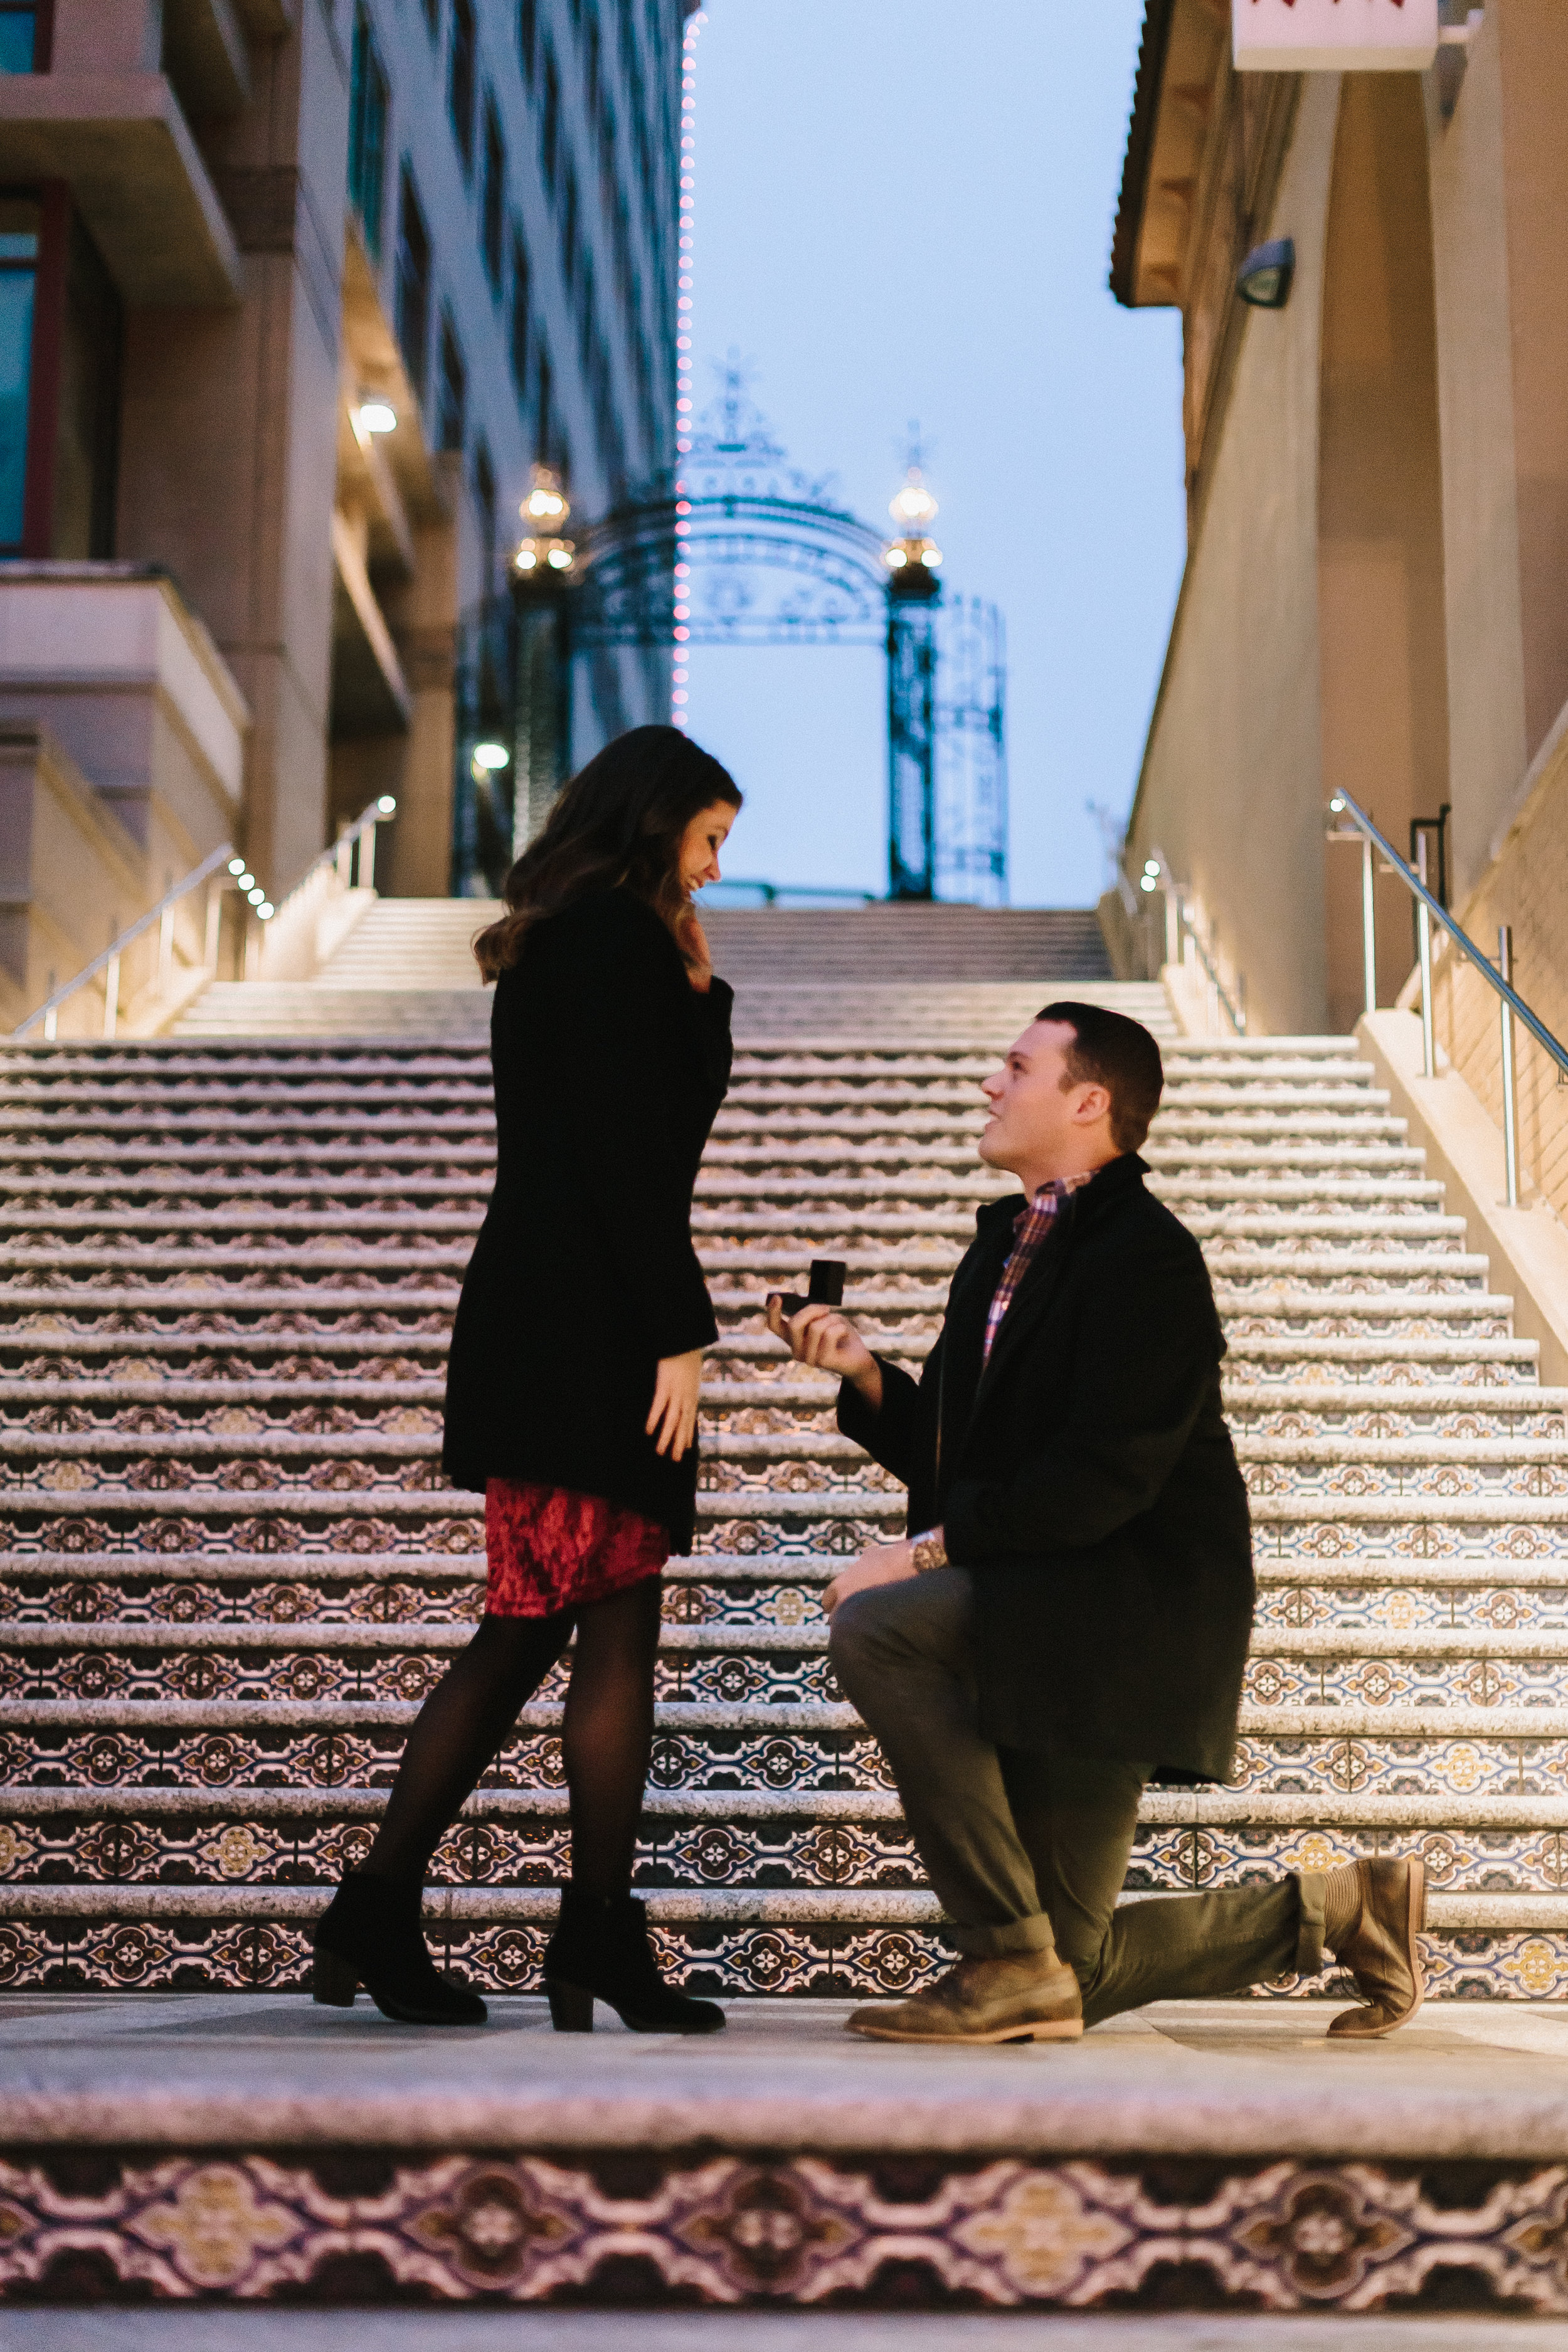 alyssa barletter photography christmas winter wedding proposal plaza lights plaza stairs she said yes-2.jpg